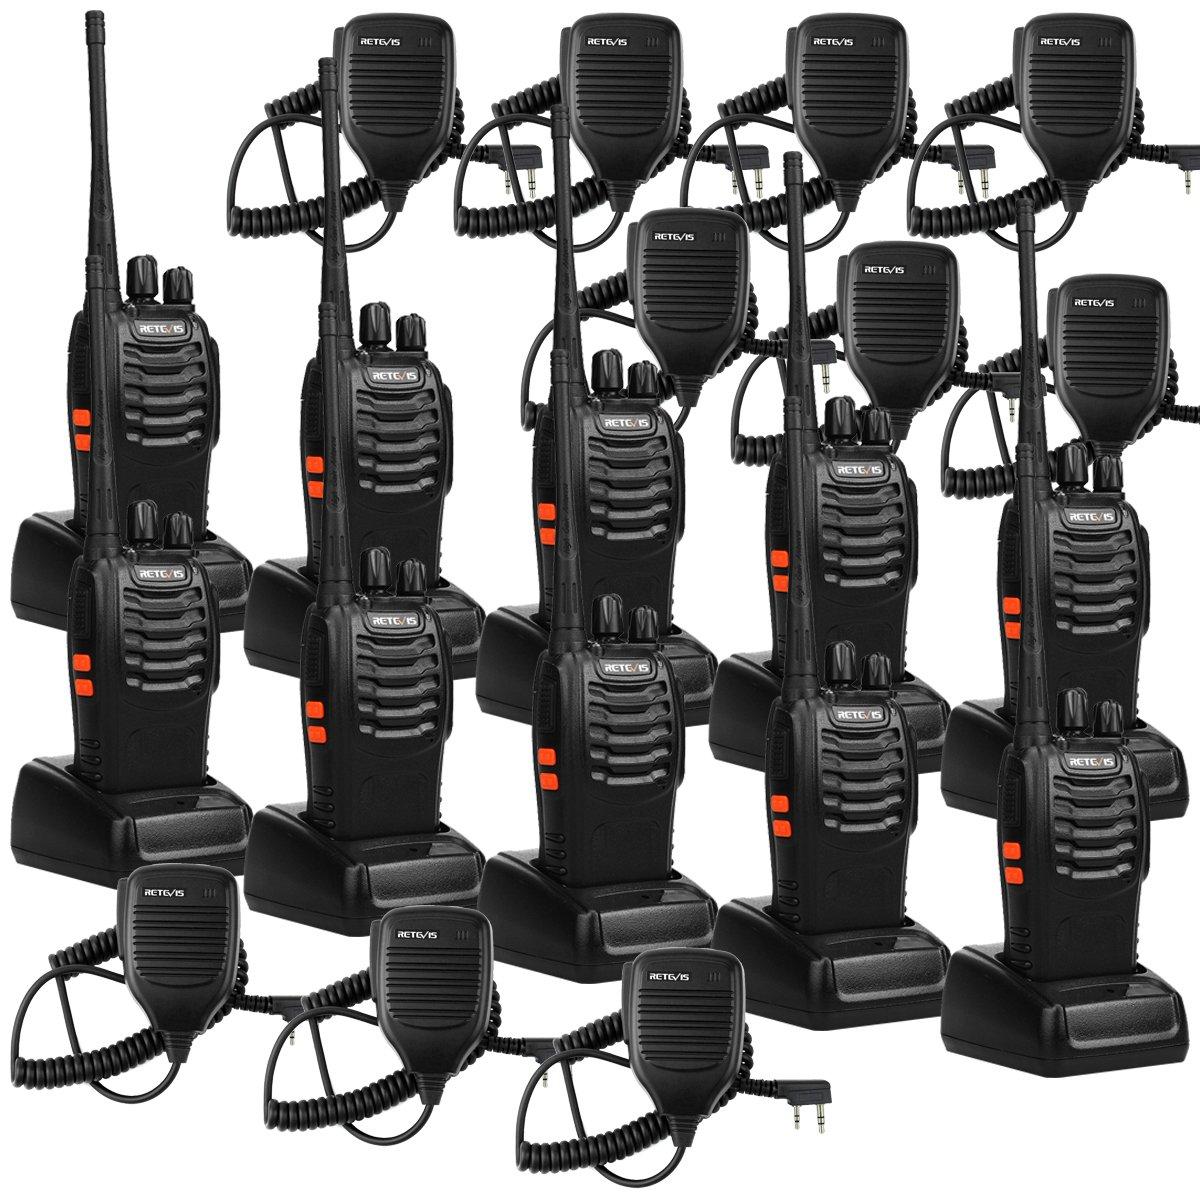 Retevis H-777 Walkie Talkie 16CH UHF Radio 2 Way Radio Handheld Radio VOX Radio Long Range Two Way Radio with Speaker Mic 10 Pack